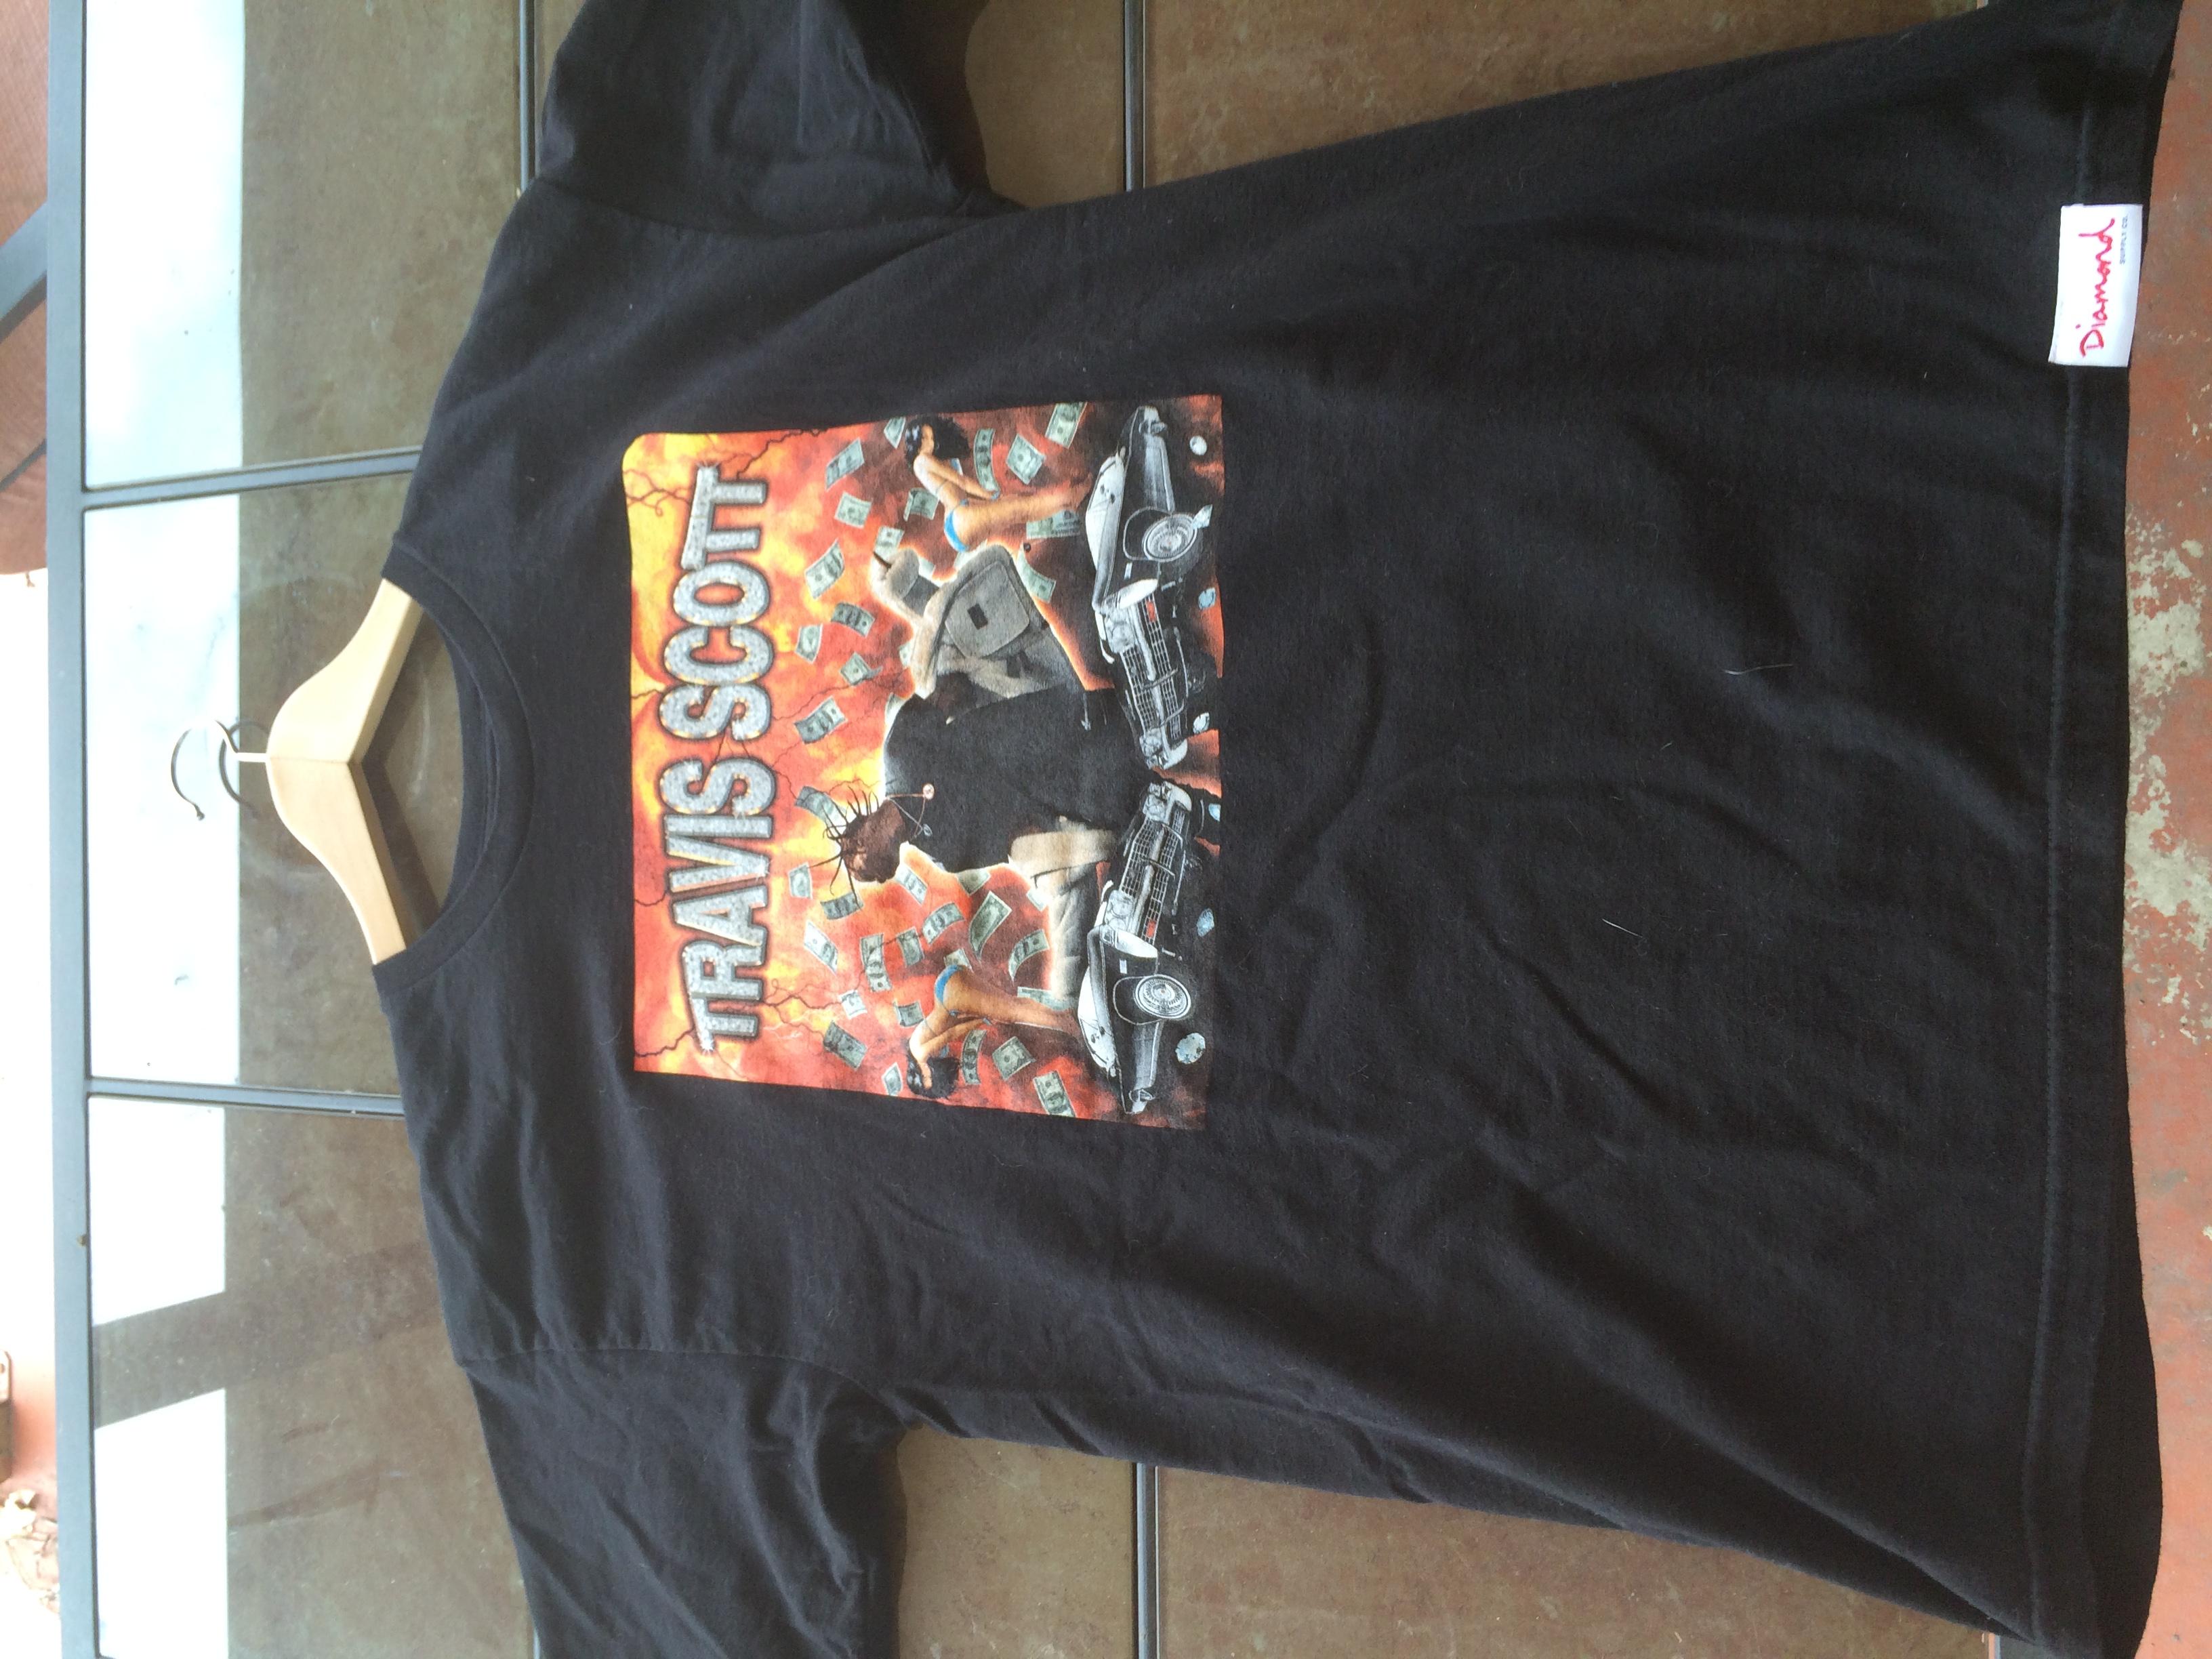 54dd999c46bc Travis Scott Diamond Supply Co. X Travi$ Scott Explosion T-shirt | Grailed